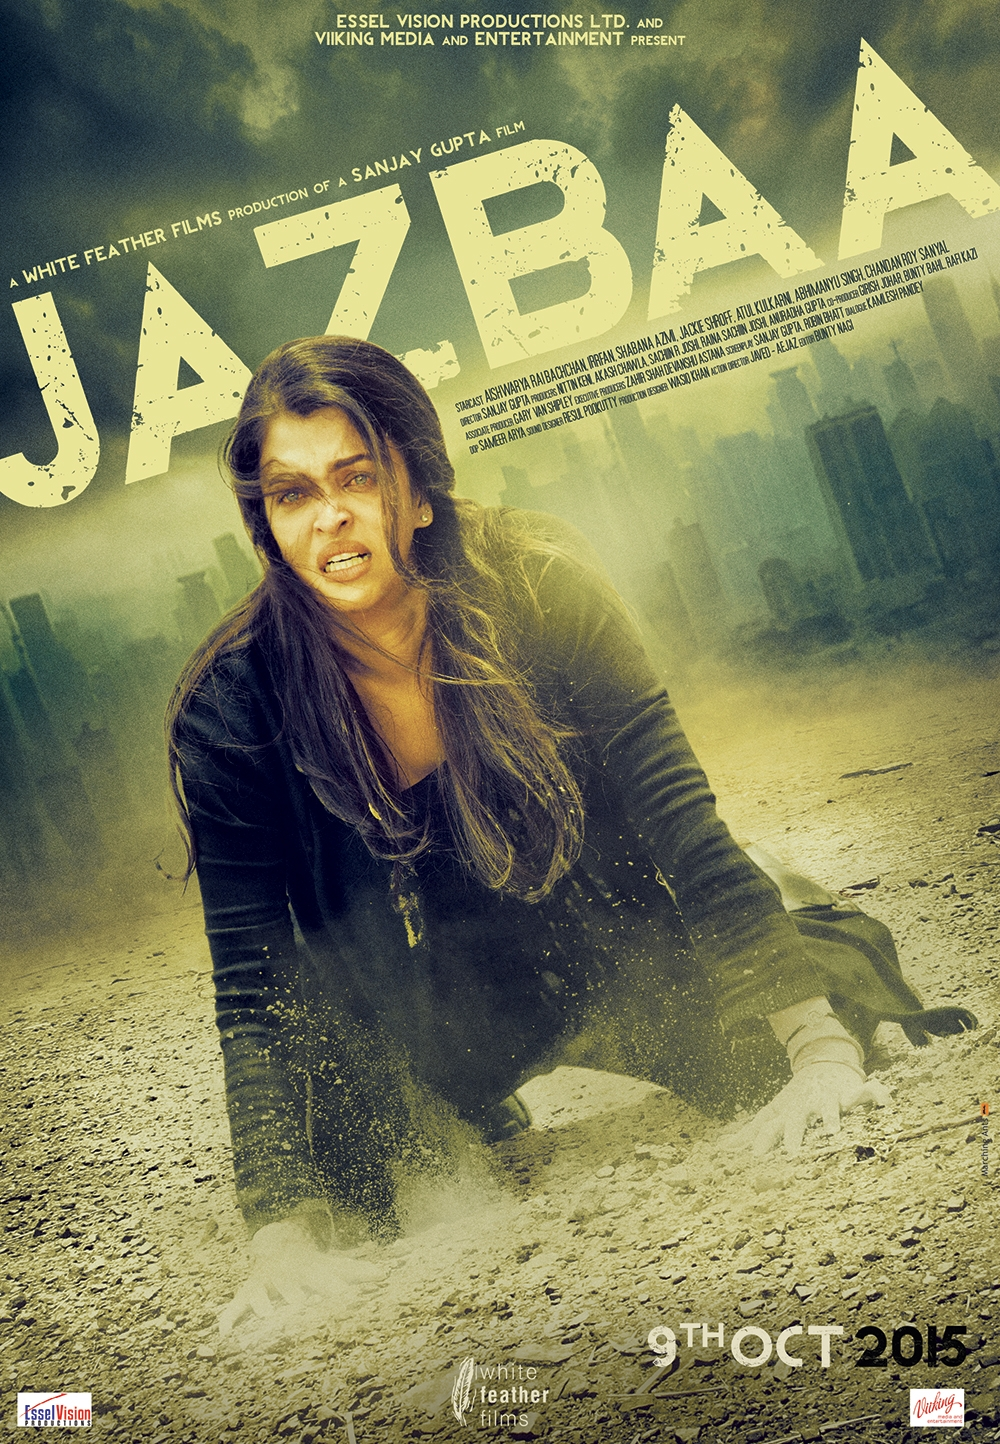 Ash in Jazbaa